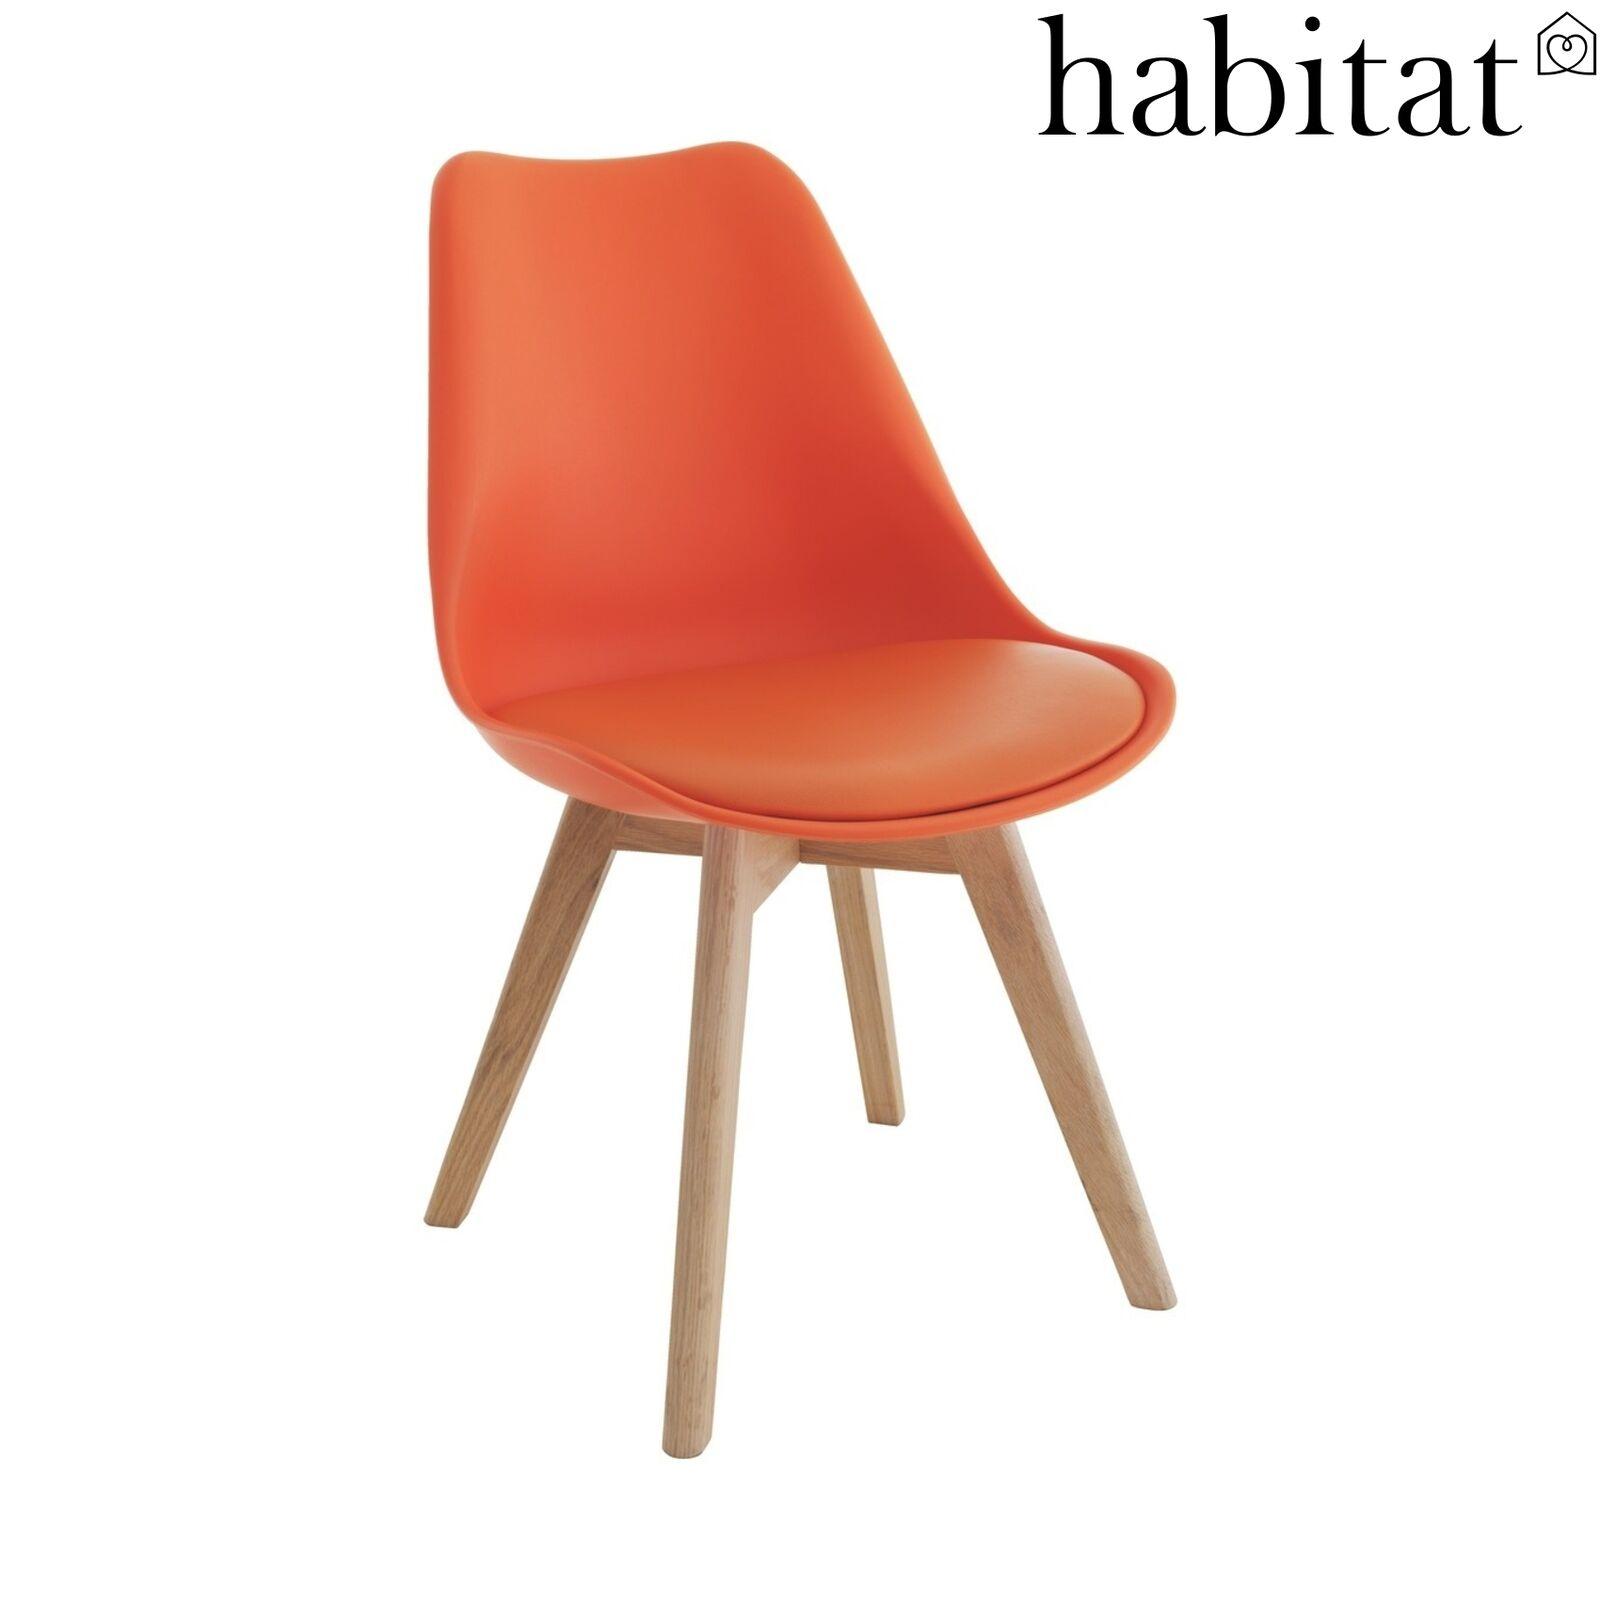 4x Habitat Jerry Chairs Kitchen / Dinning (used) - £221 @ Argos eBay